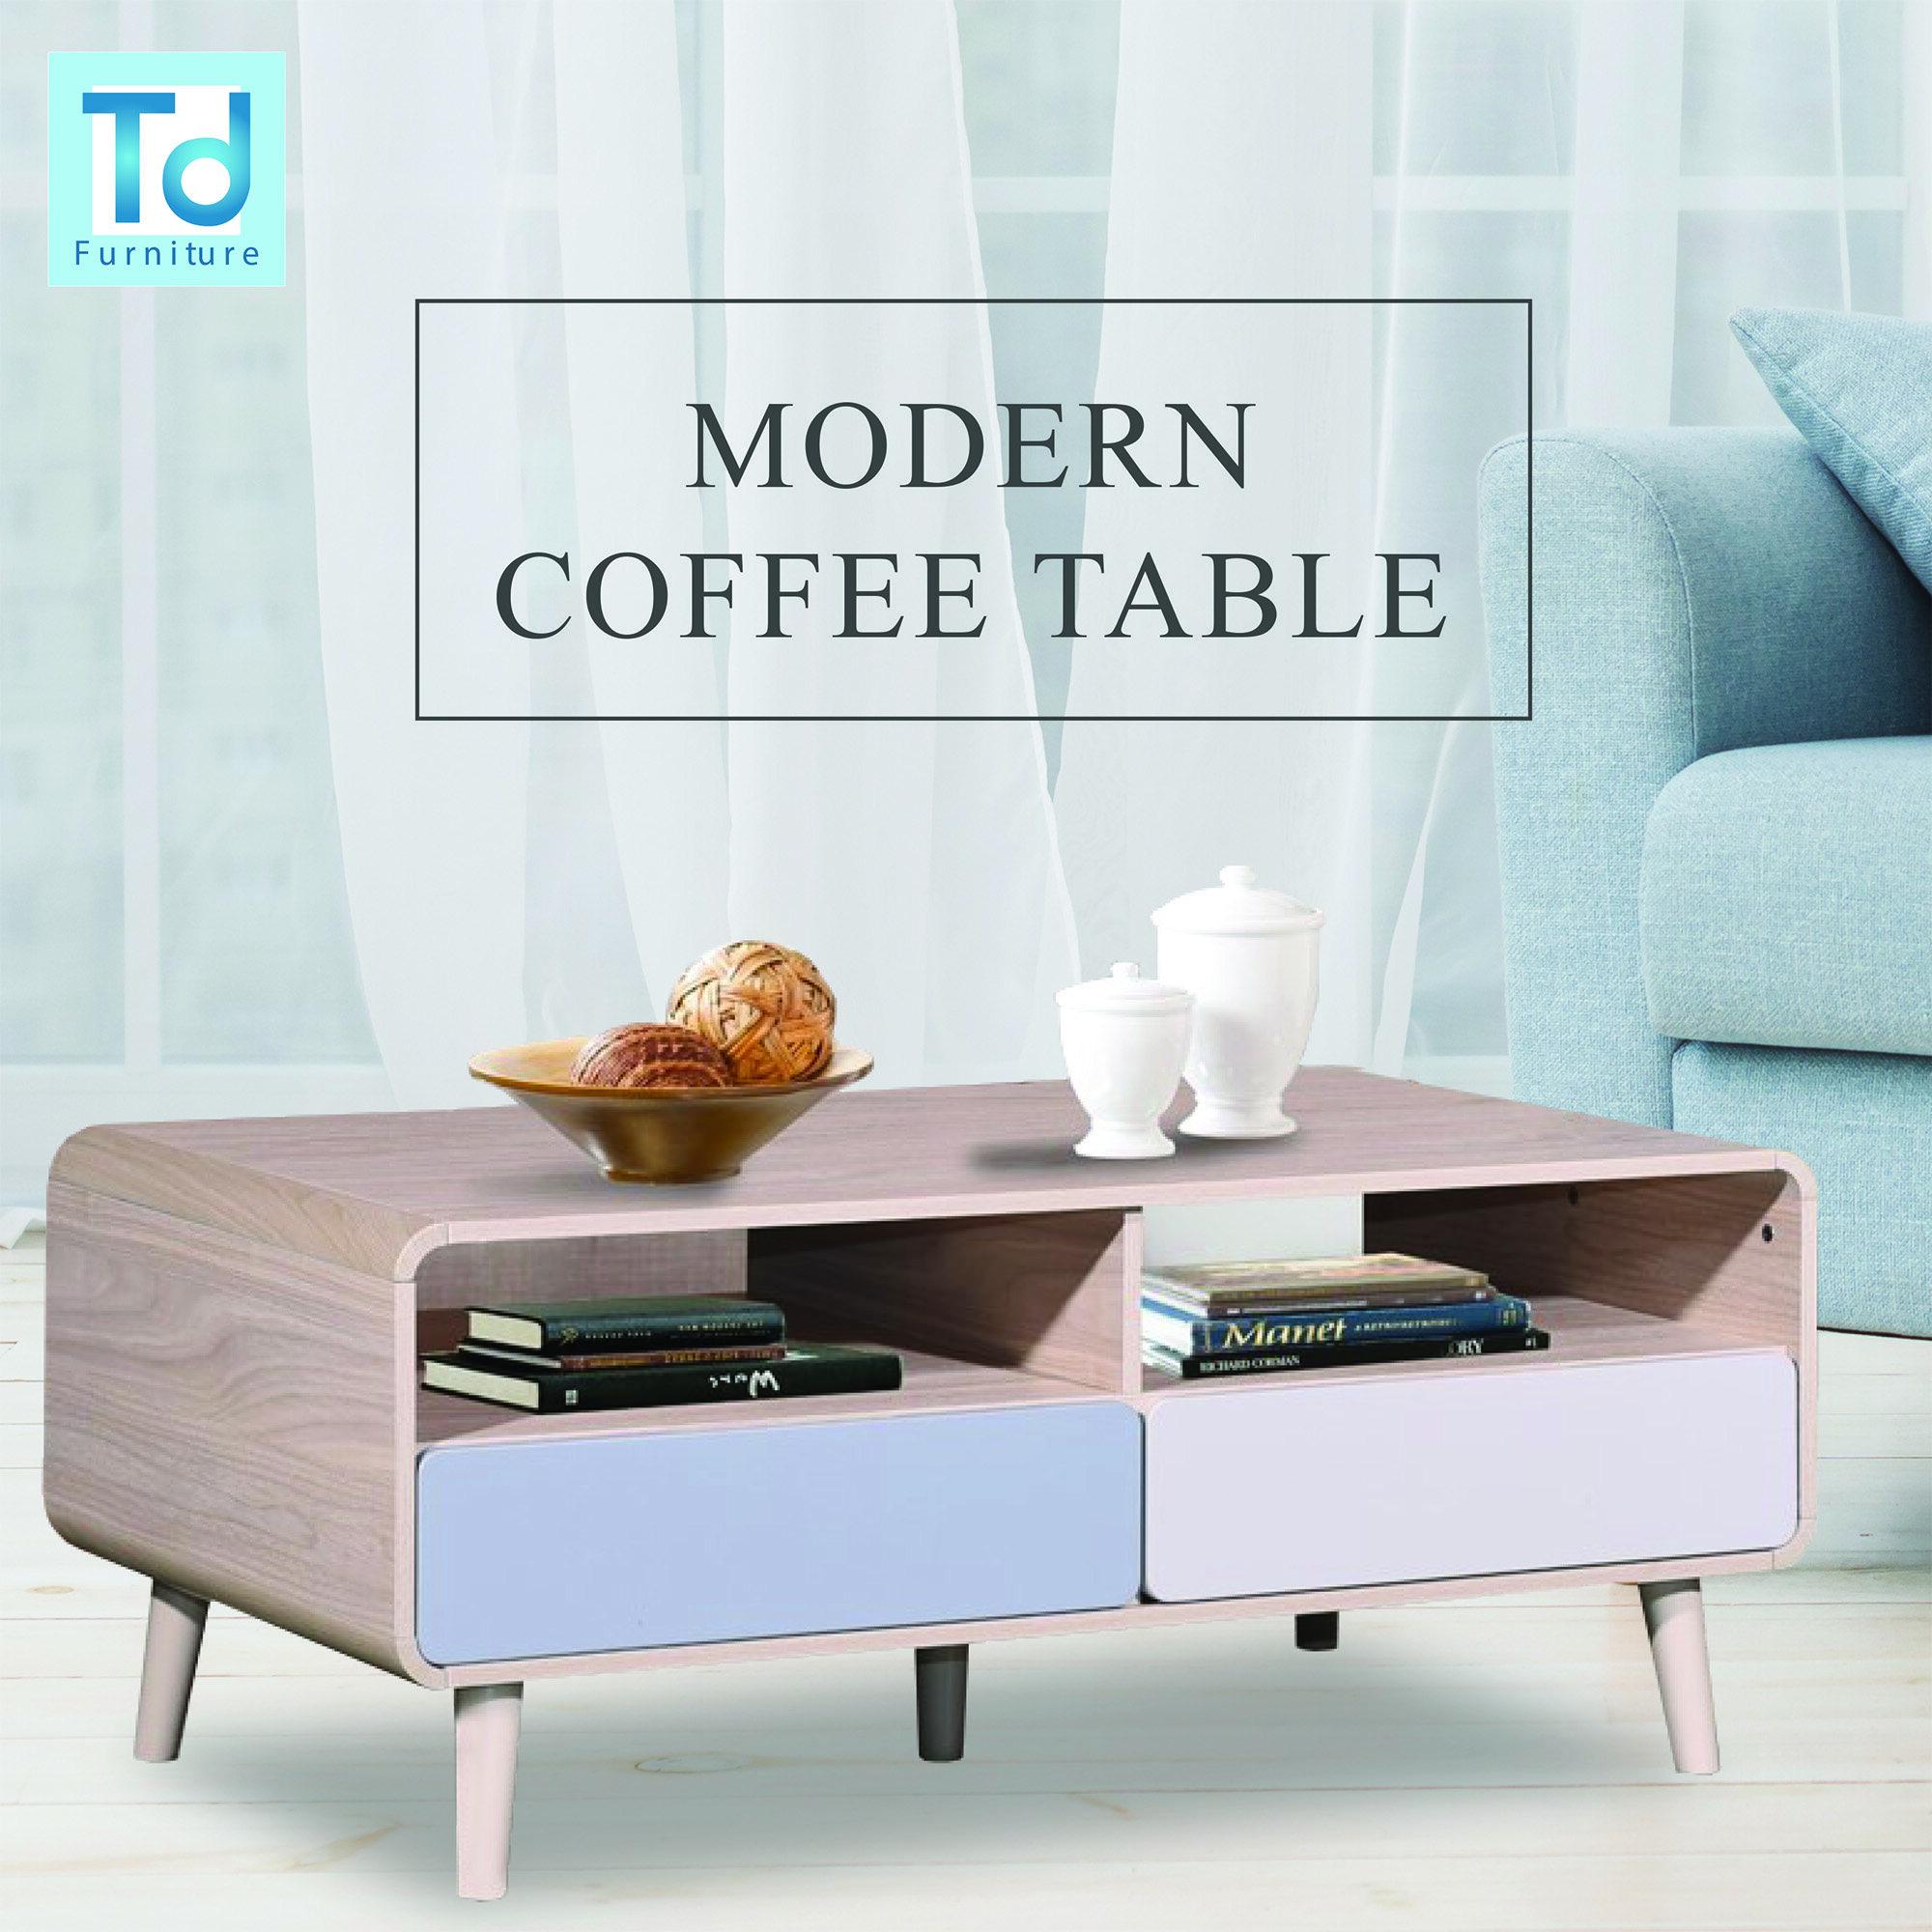 nova modern coffee table melamine coffee table light blue model design with 4 drawer